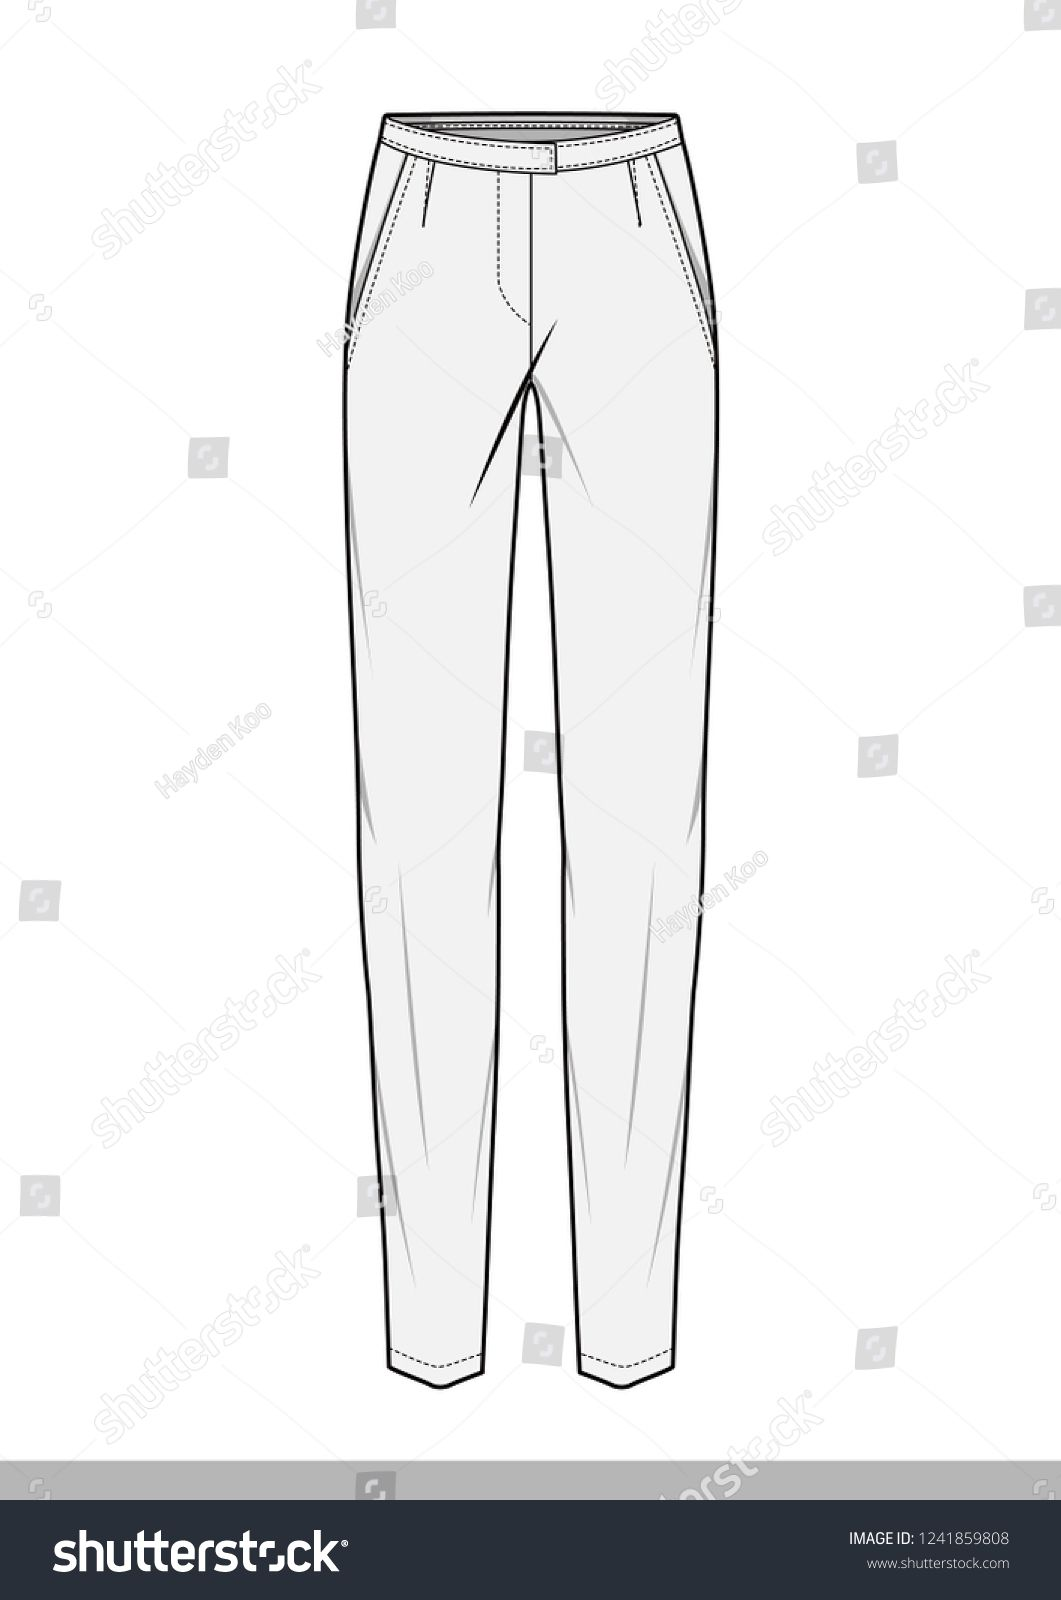 Pants Fashion Flat Technical Drawing Template Diseno De Ropa Figuras De La Moda Bocetos De Ropa